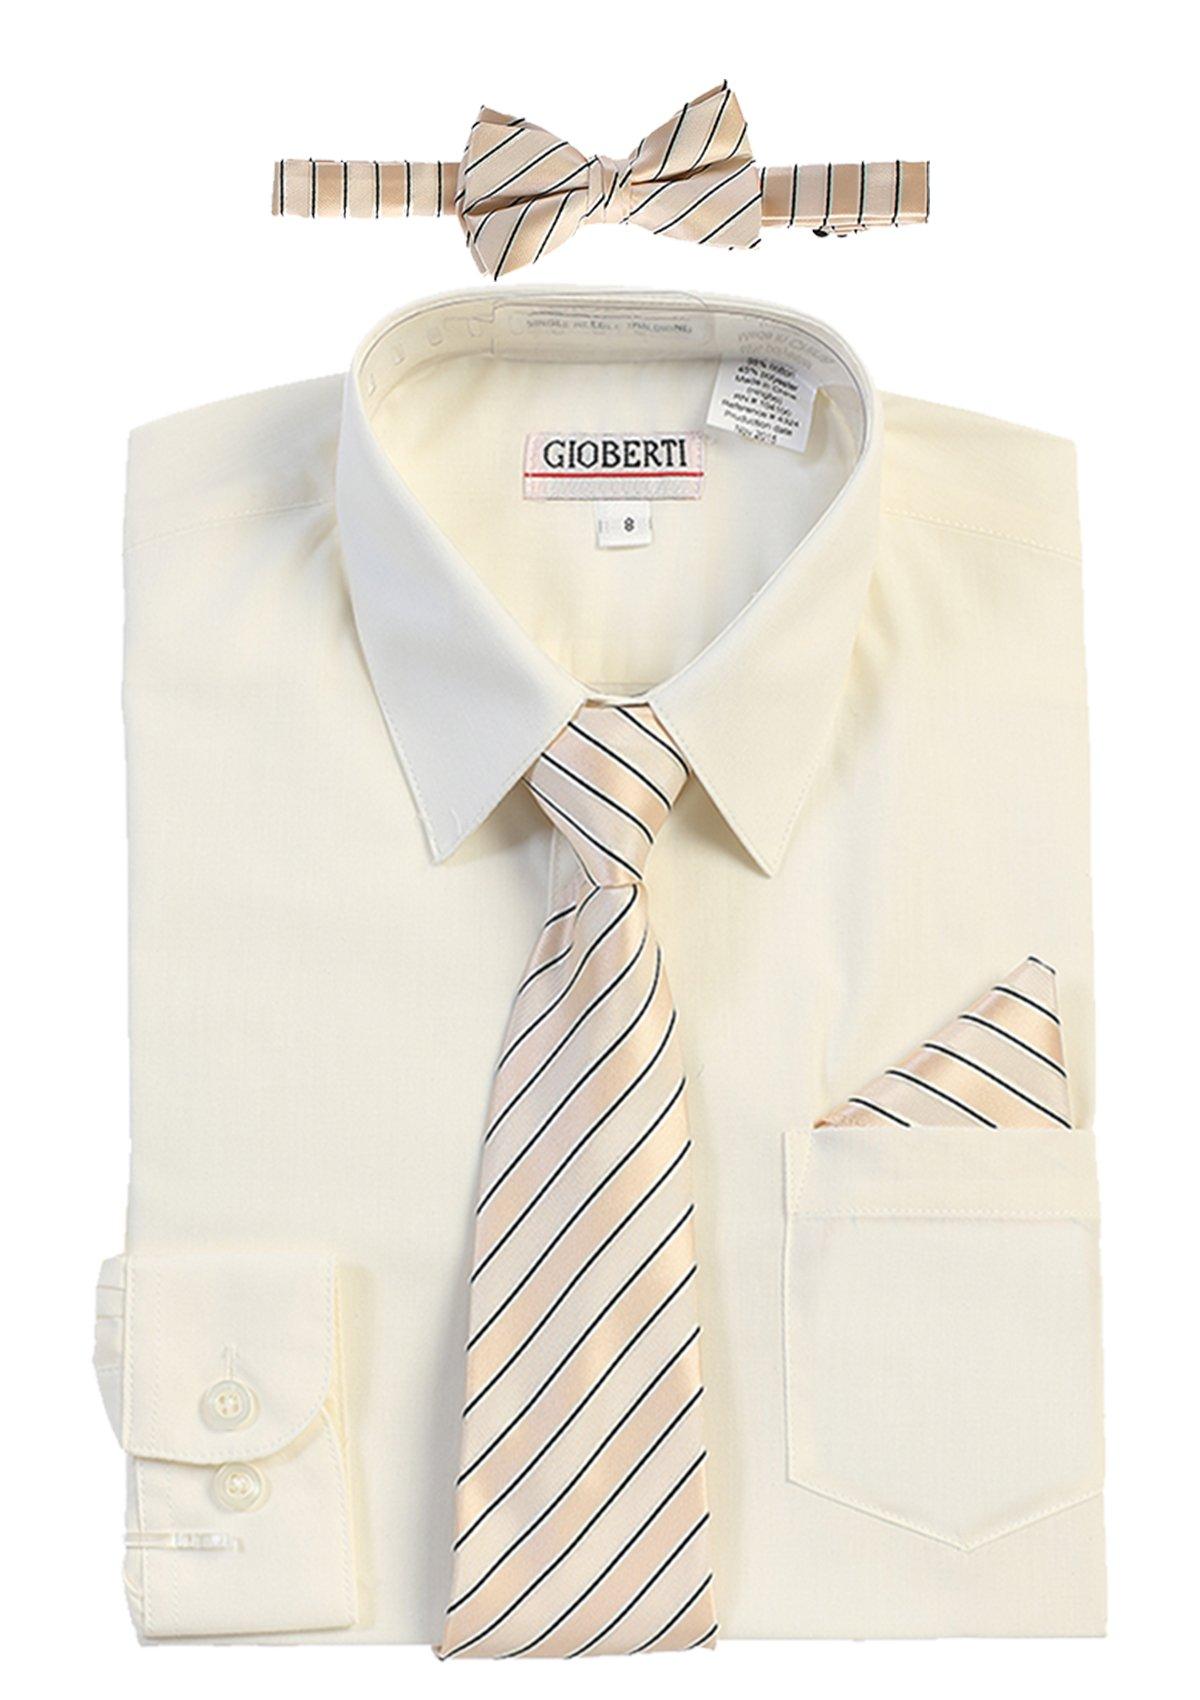 Gioberti Boy's Long Sleeve Dress Shirt + Stripe Zippered Tie Set, Ivory, Size 14